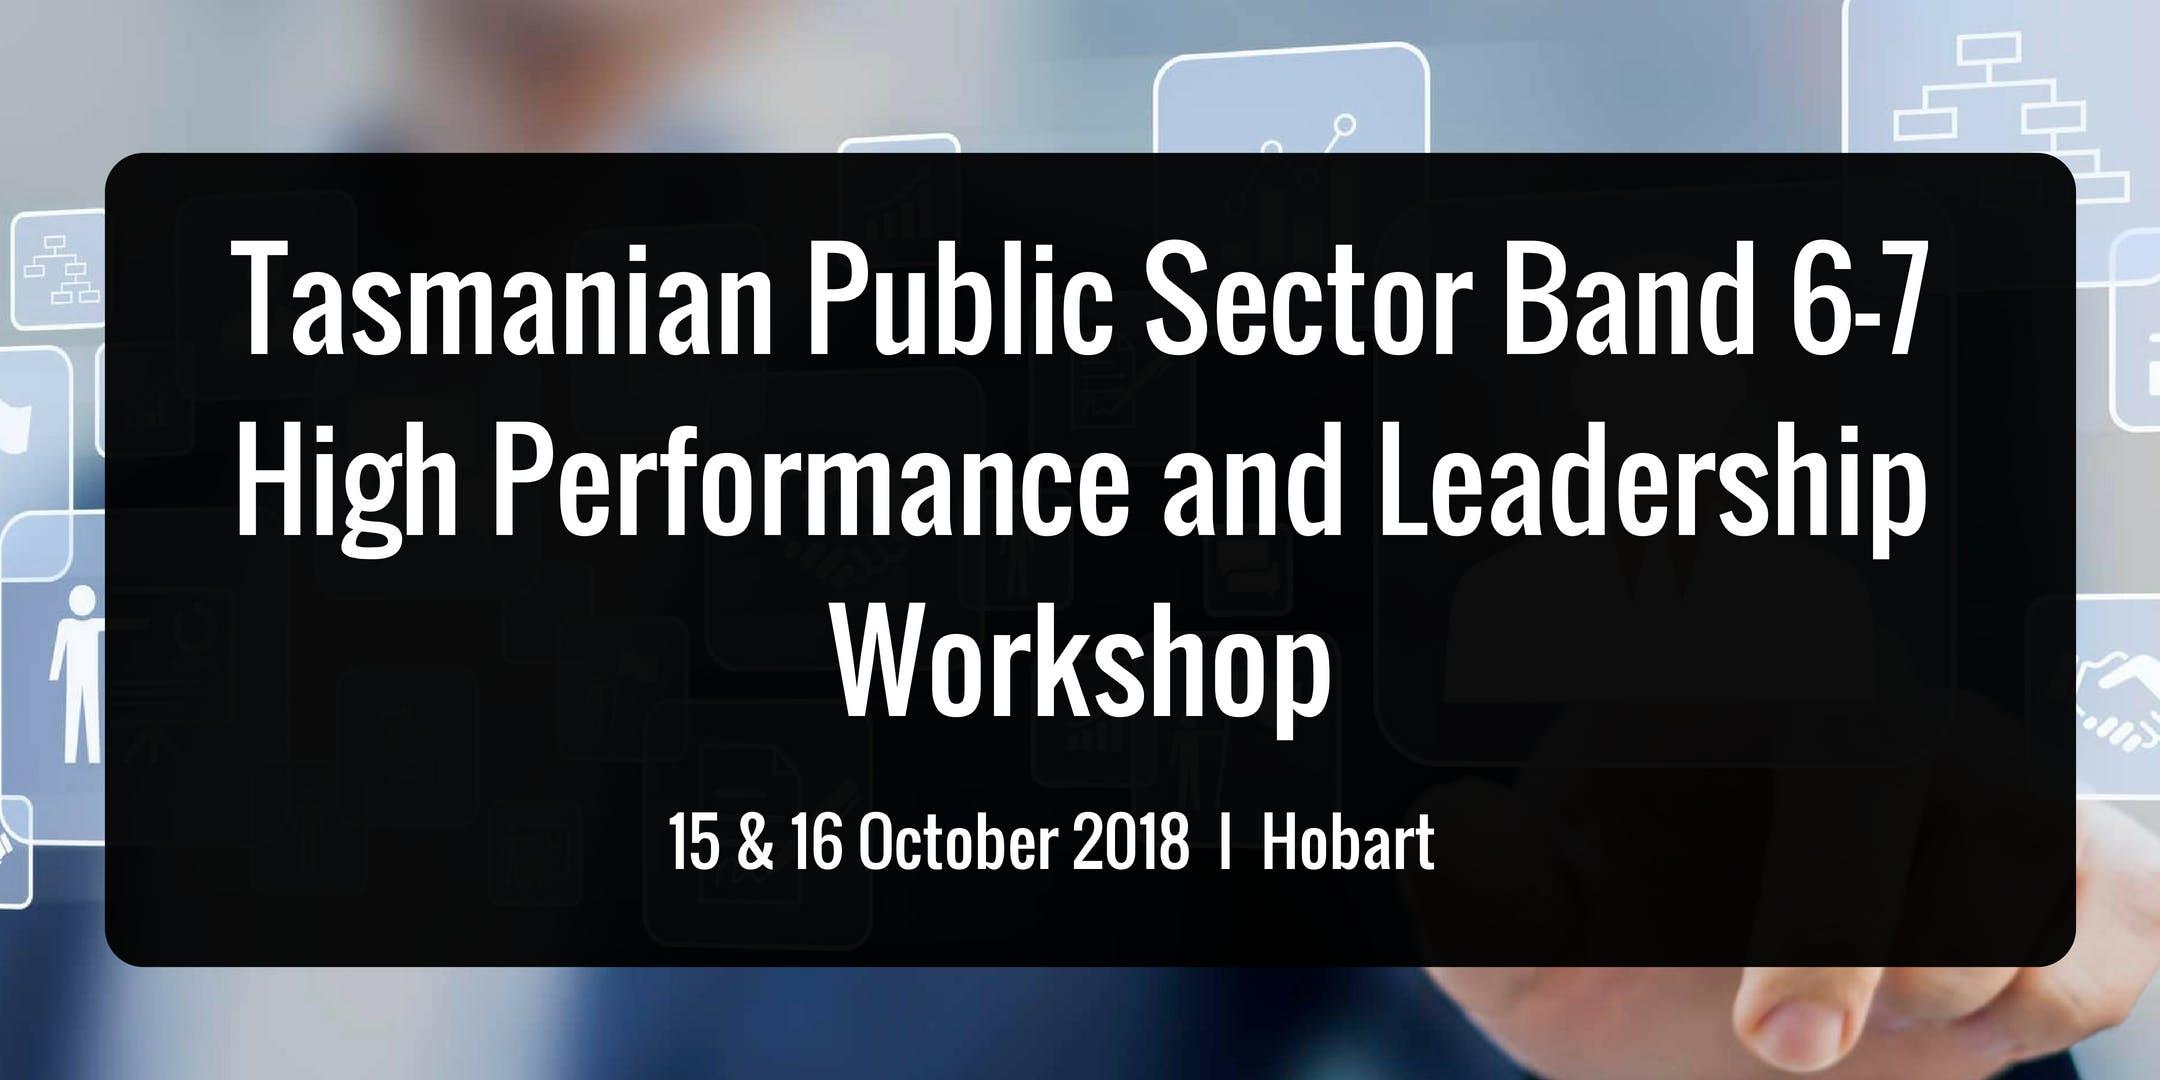 Tasmanian Public Sector Band 6-7 High Performance and Leadership Workshop